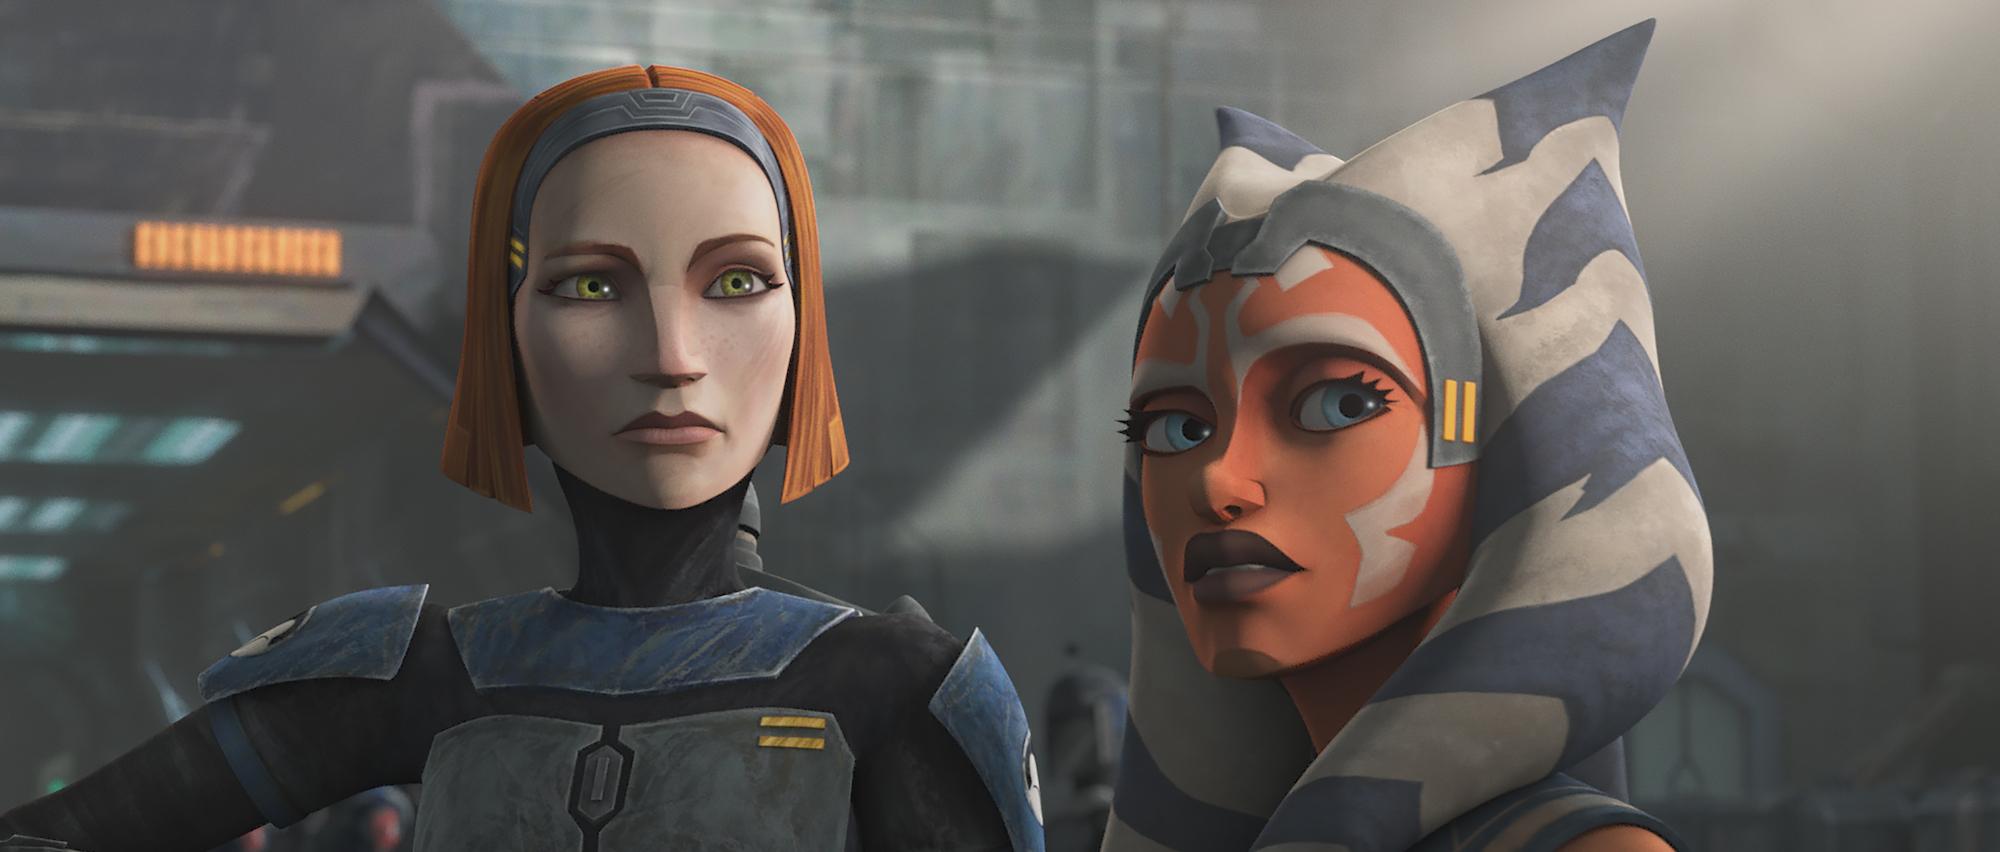 Bo-Katan and Ahsoka Tano in Season 7 of 'Star Wars: The Clone Wars'